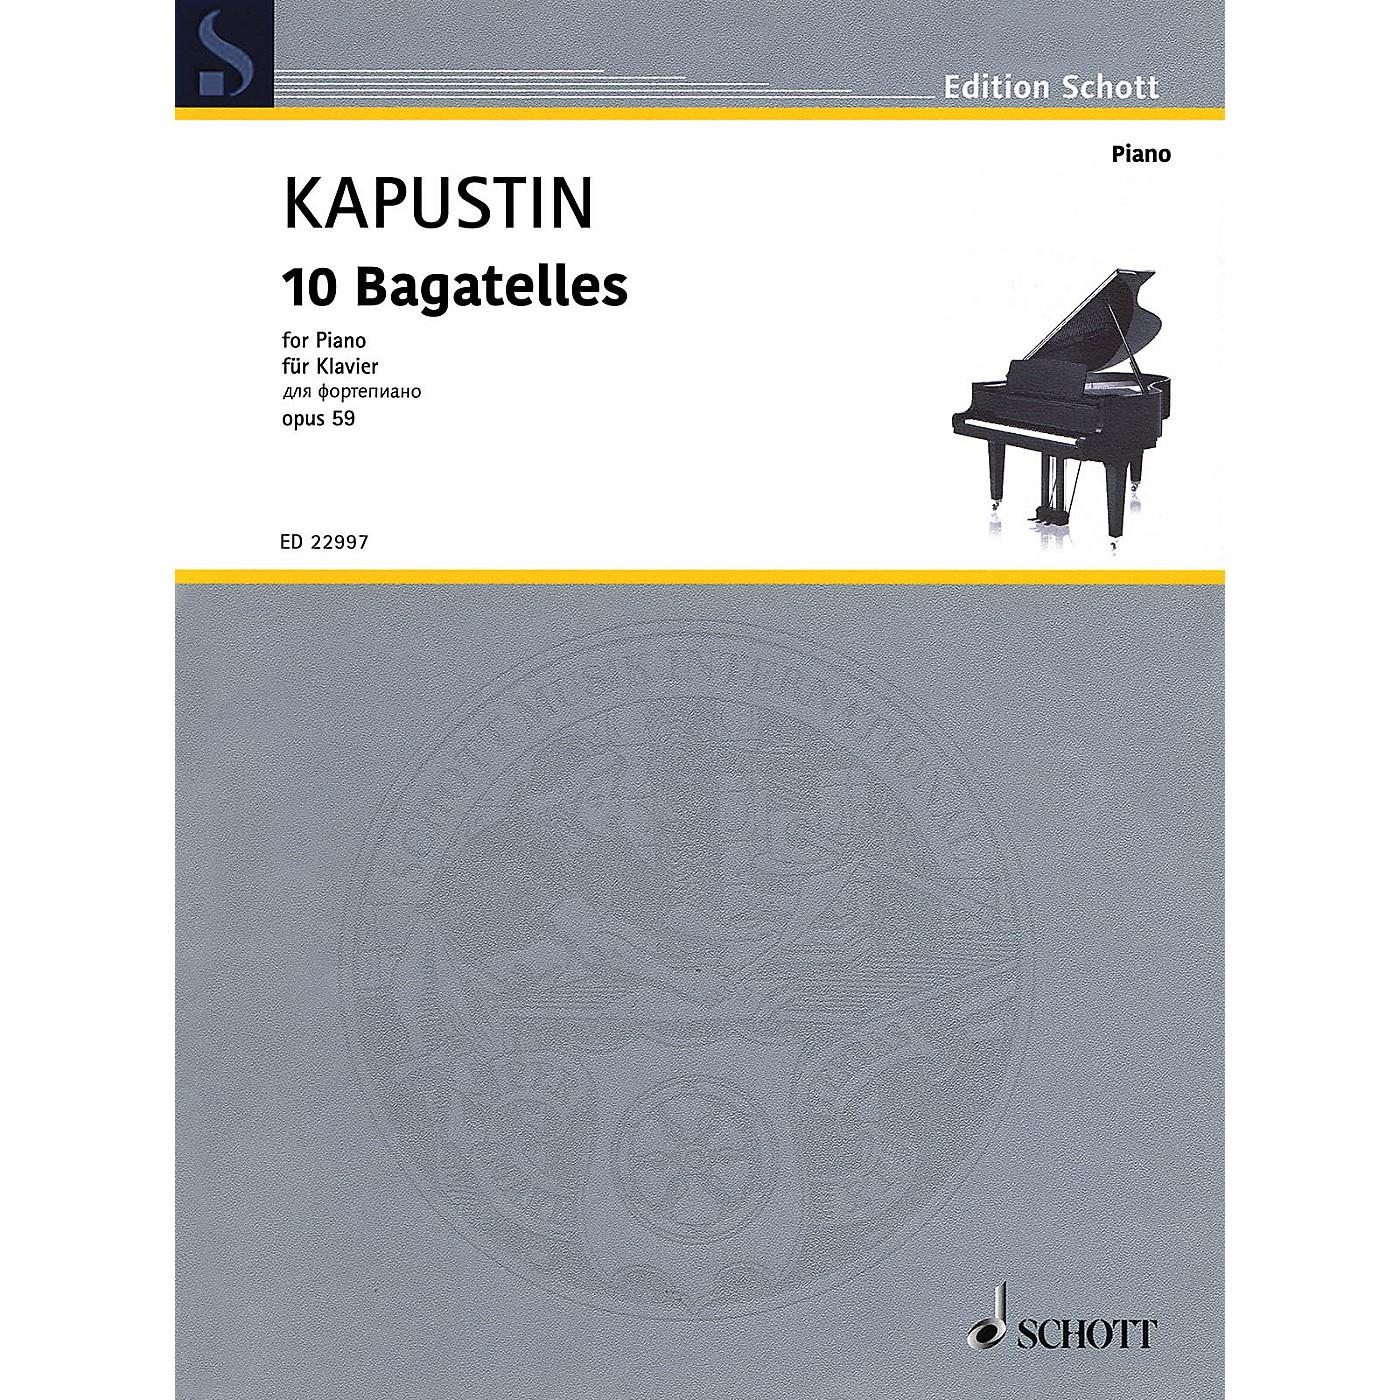 Schott 10 Bagatelles, Op. 59 Piano Solo by Kapustin thumbnail